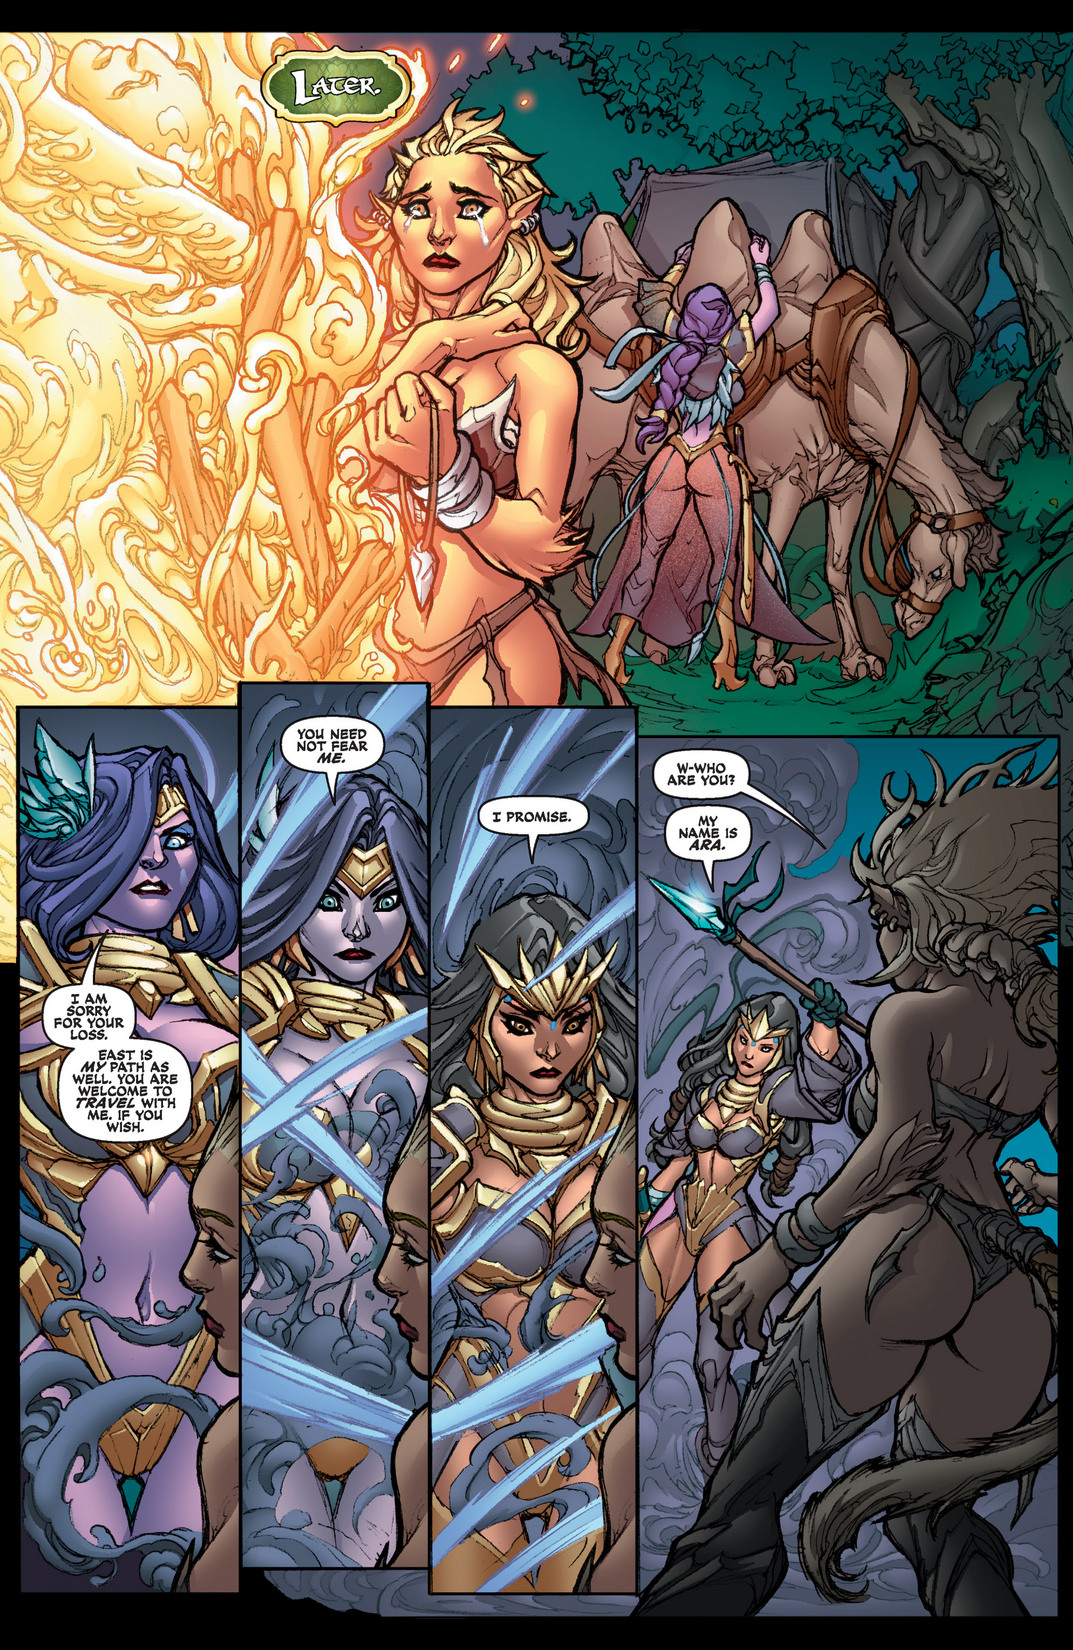 Read online Jirni comic -  Issue #1 - 10